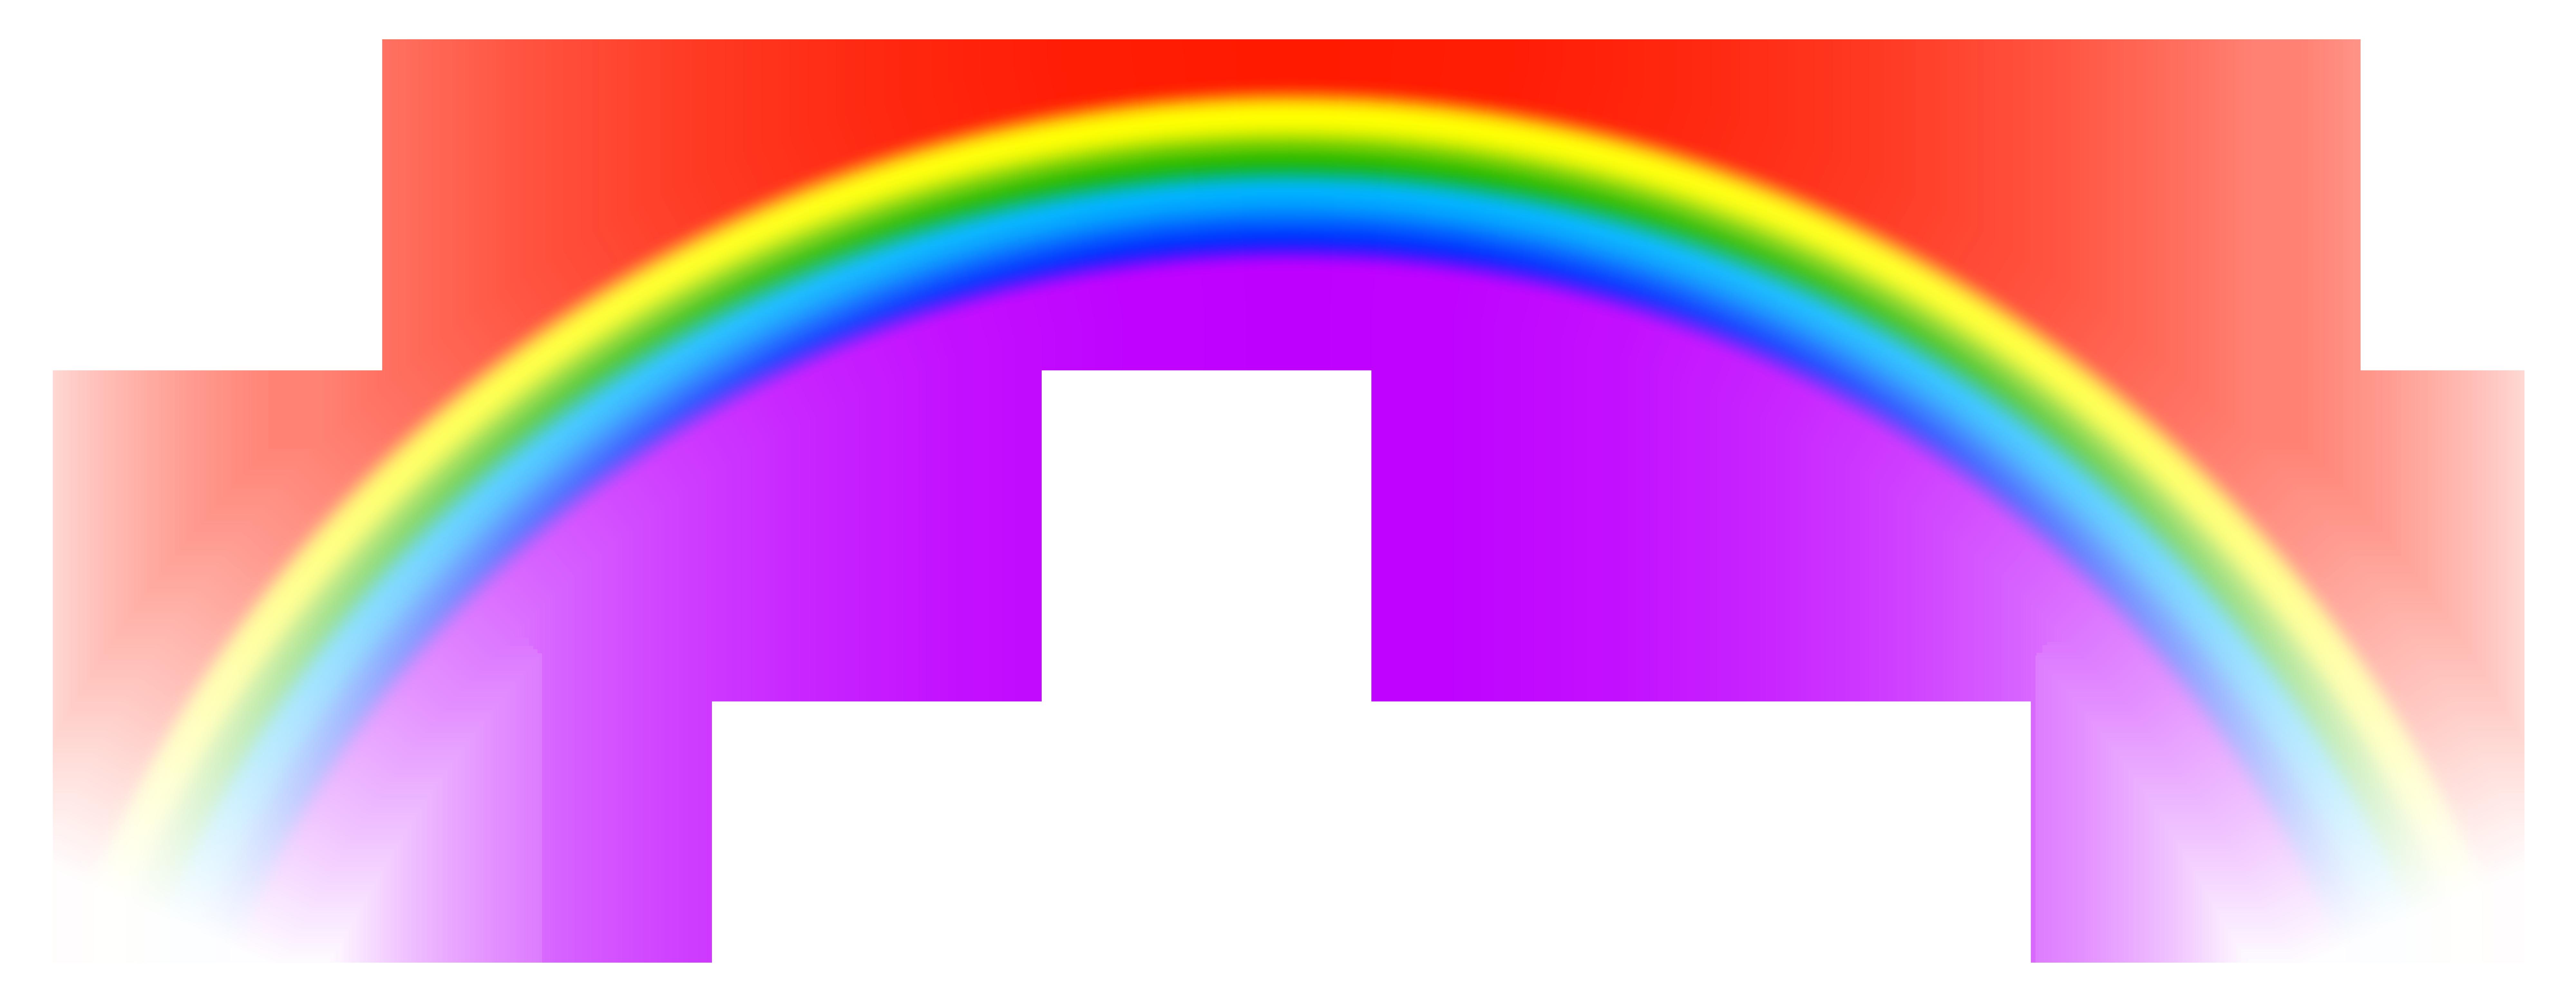 Transparent Rainbow PNG Free Clip Art Image | Free clip art